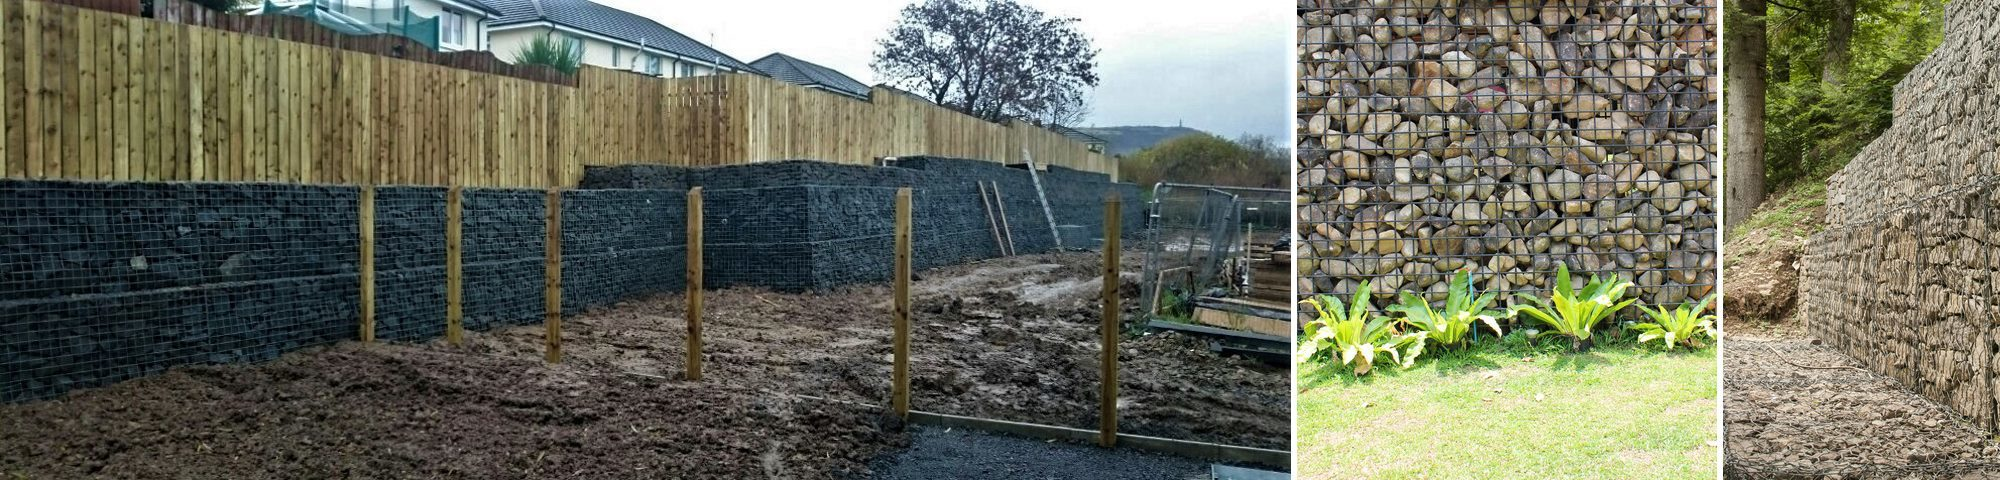 Gabion Retaining Wall Auckland | Gabion Baskets, Stone Walls